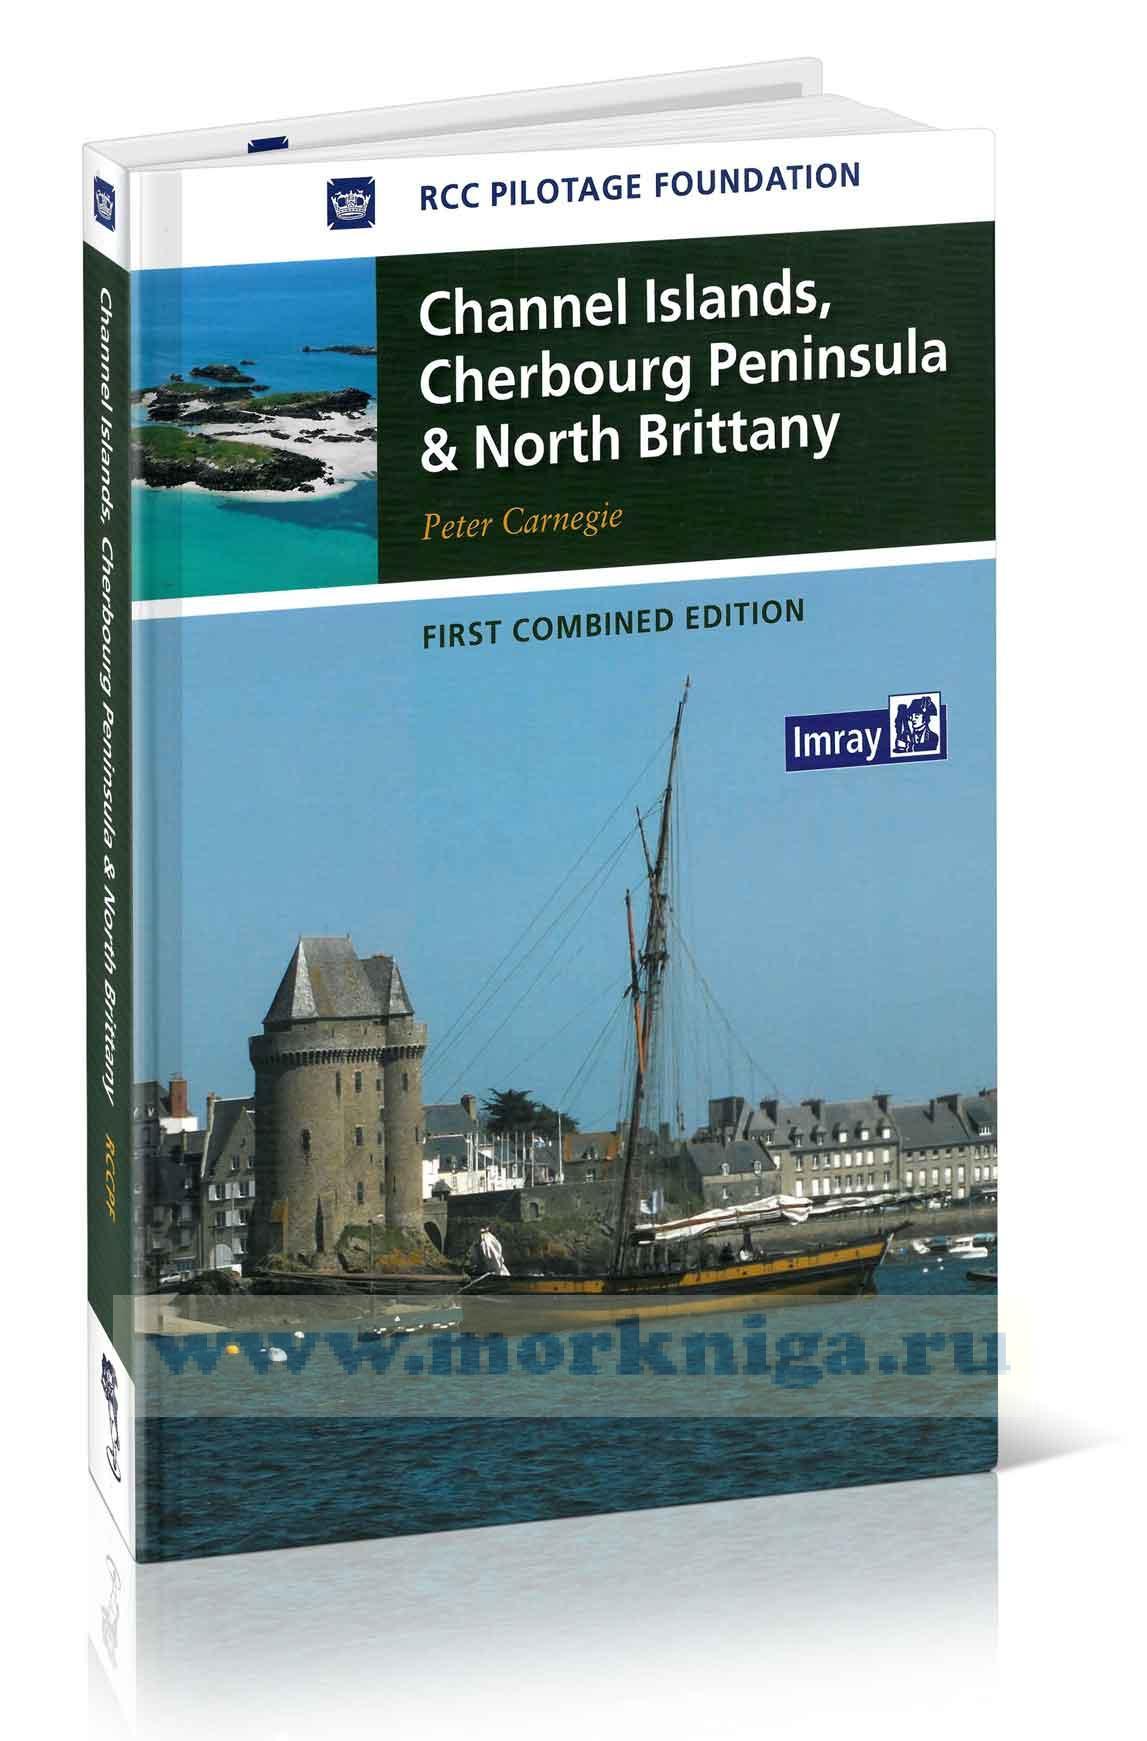 Channel Islands, Cherbourg Peninsula and North Brittany Нормандские острова, полуостров Шербур и Северная Бретань